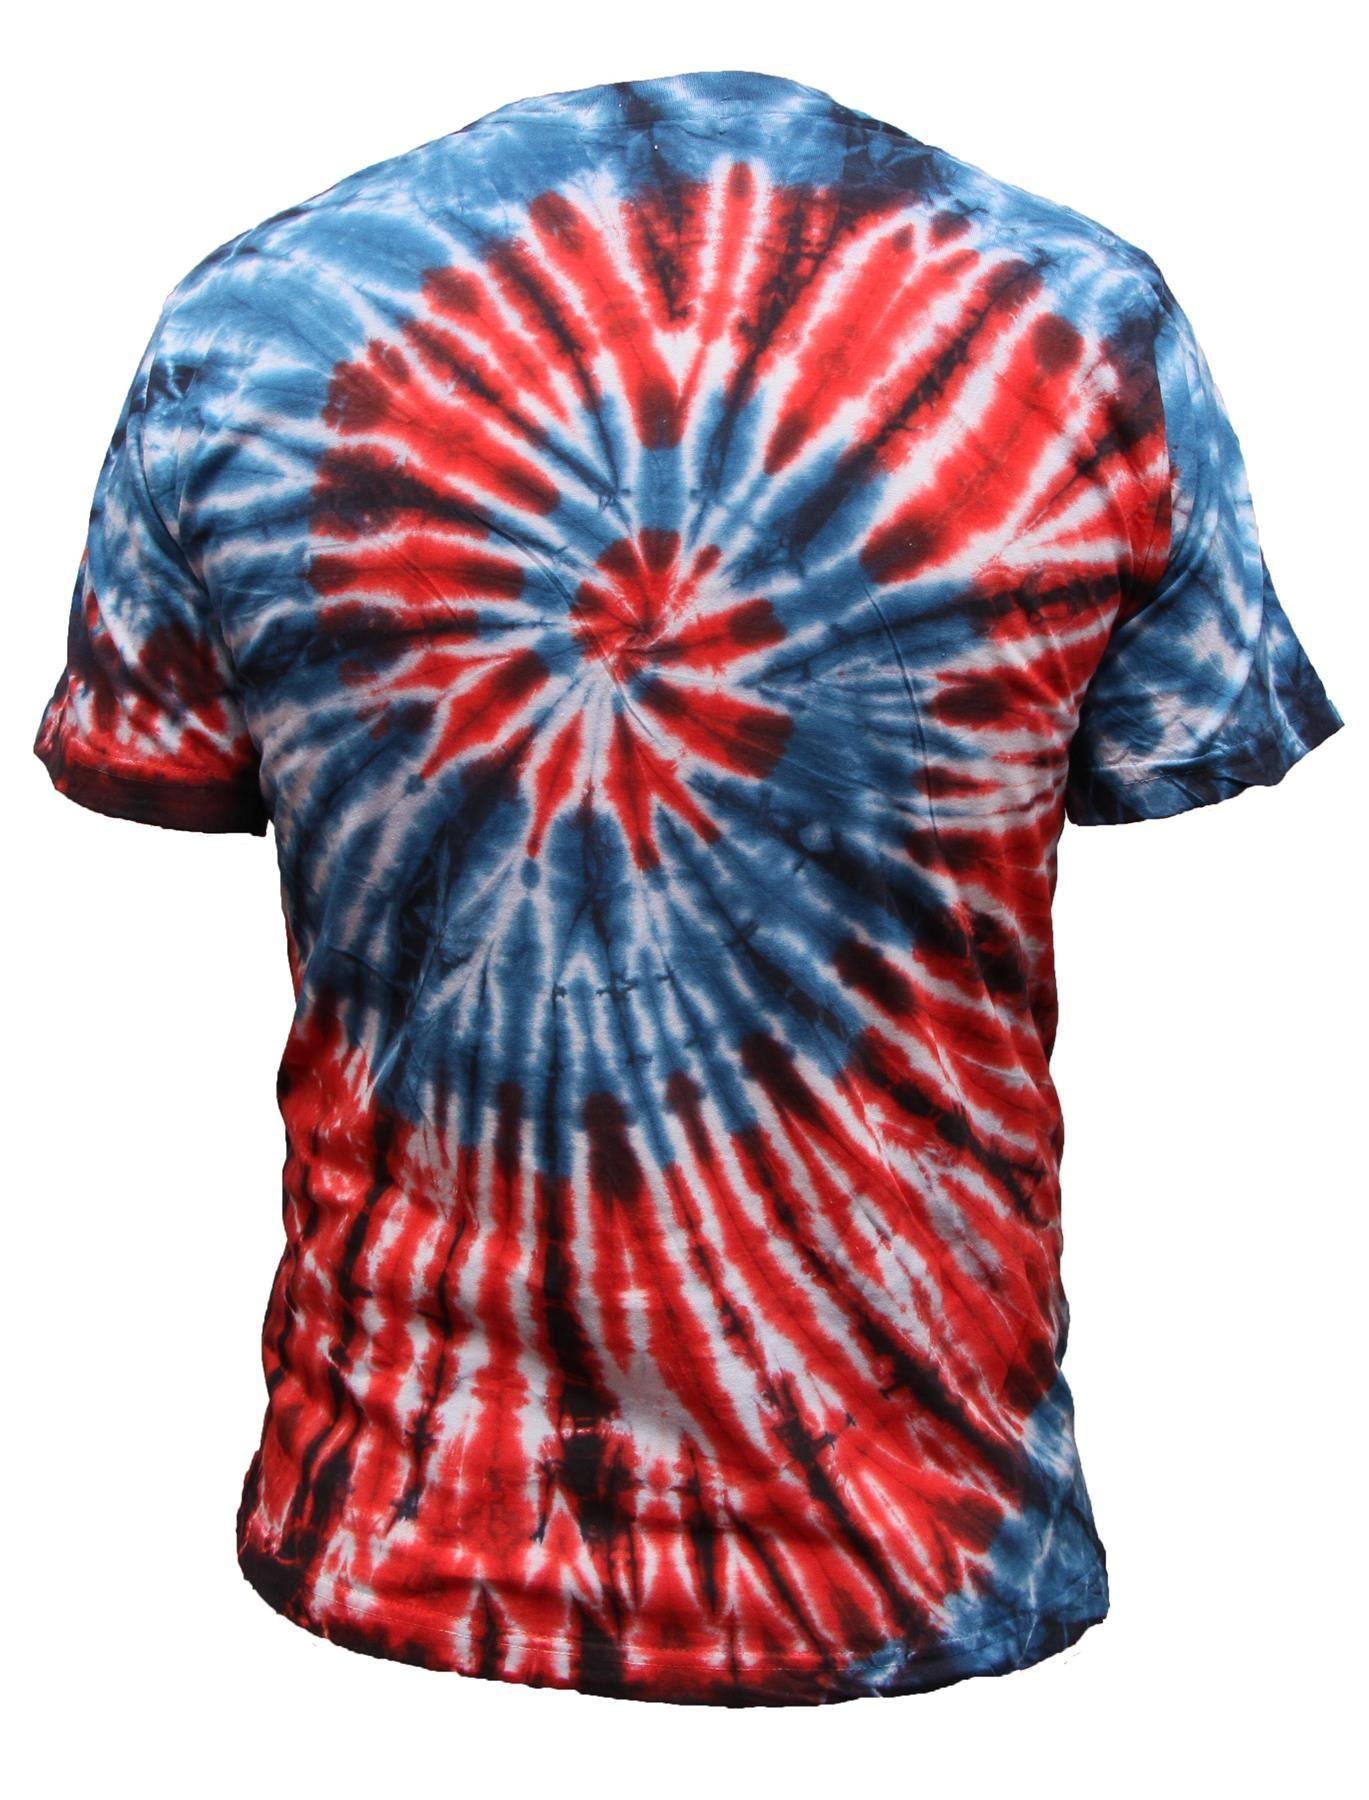 Tie-Dye-T-Shirt-Music-Festival-Tye-Dye-Tee-Hipster-Retro-Unisex-Short-Sleeve-Top thumbnail 7